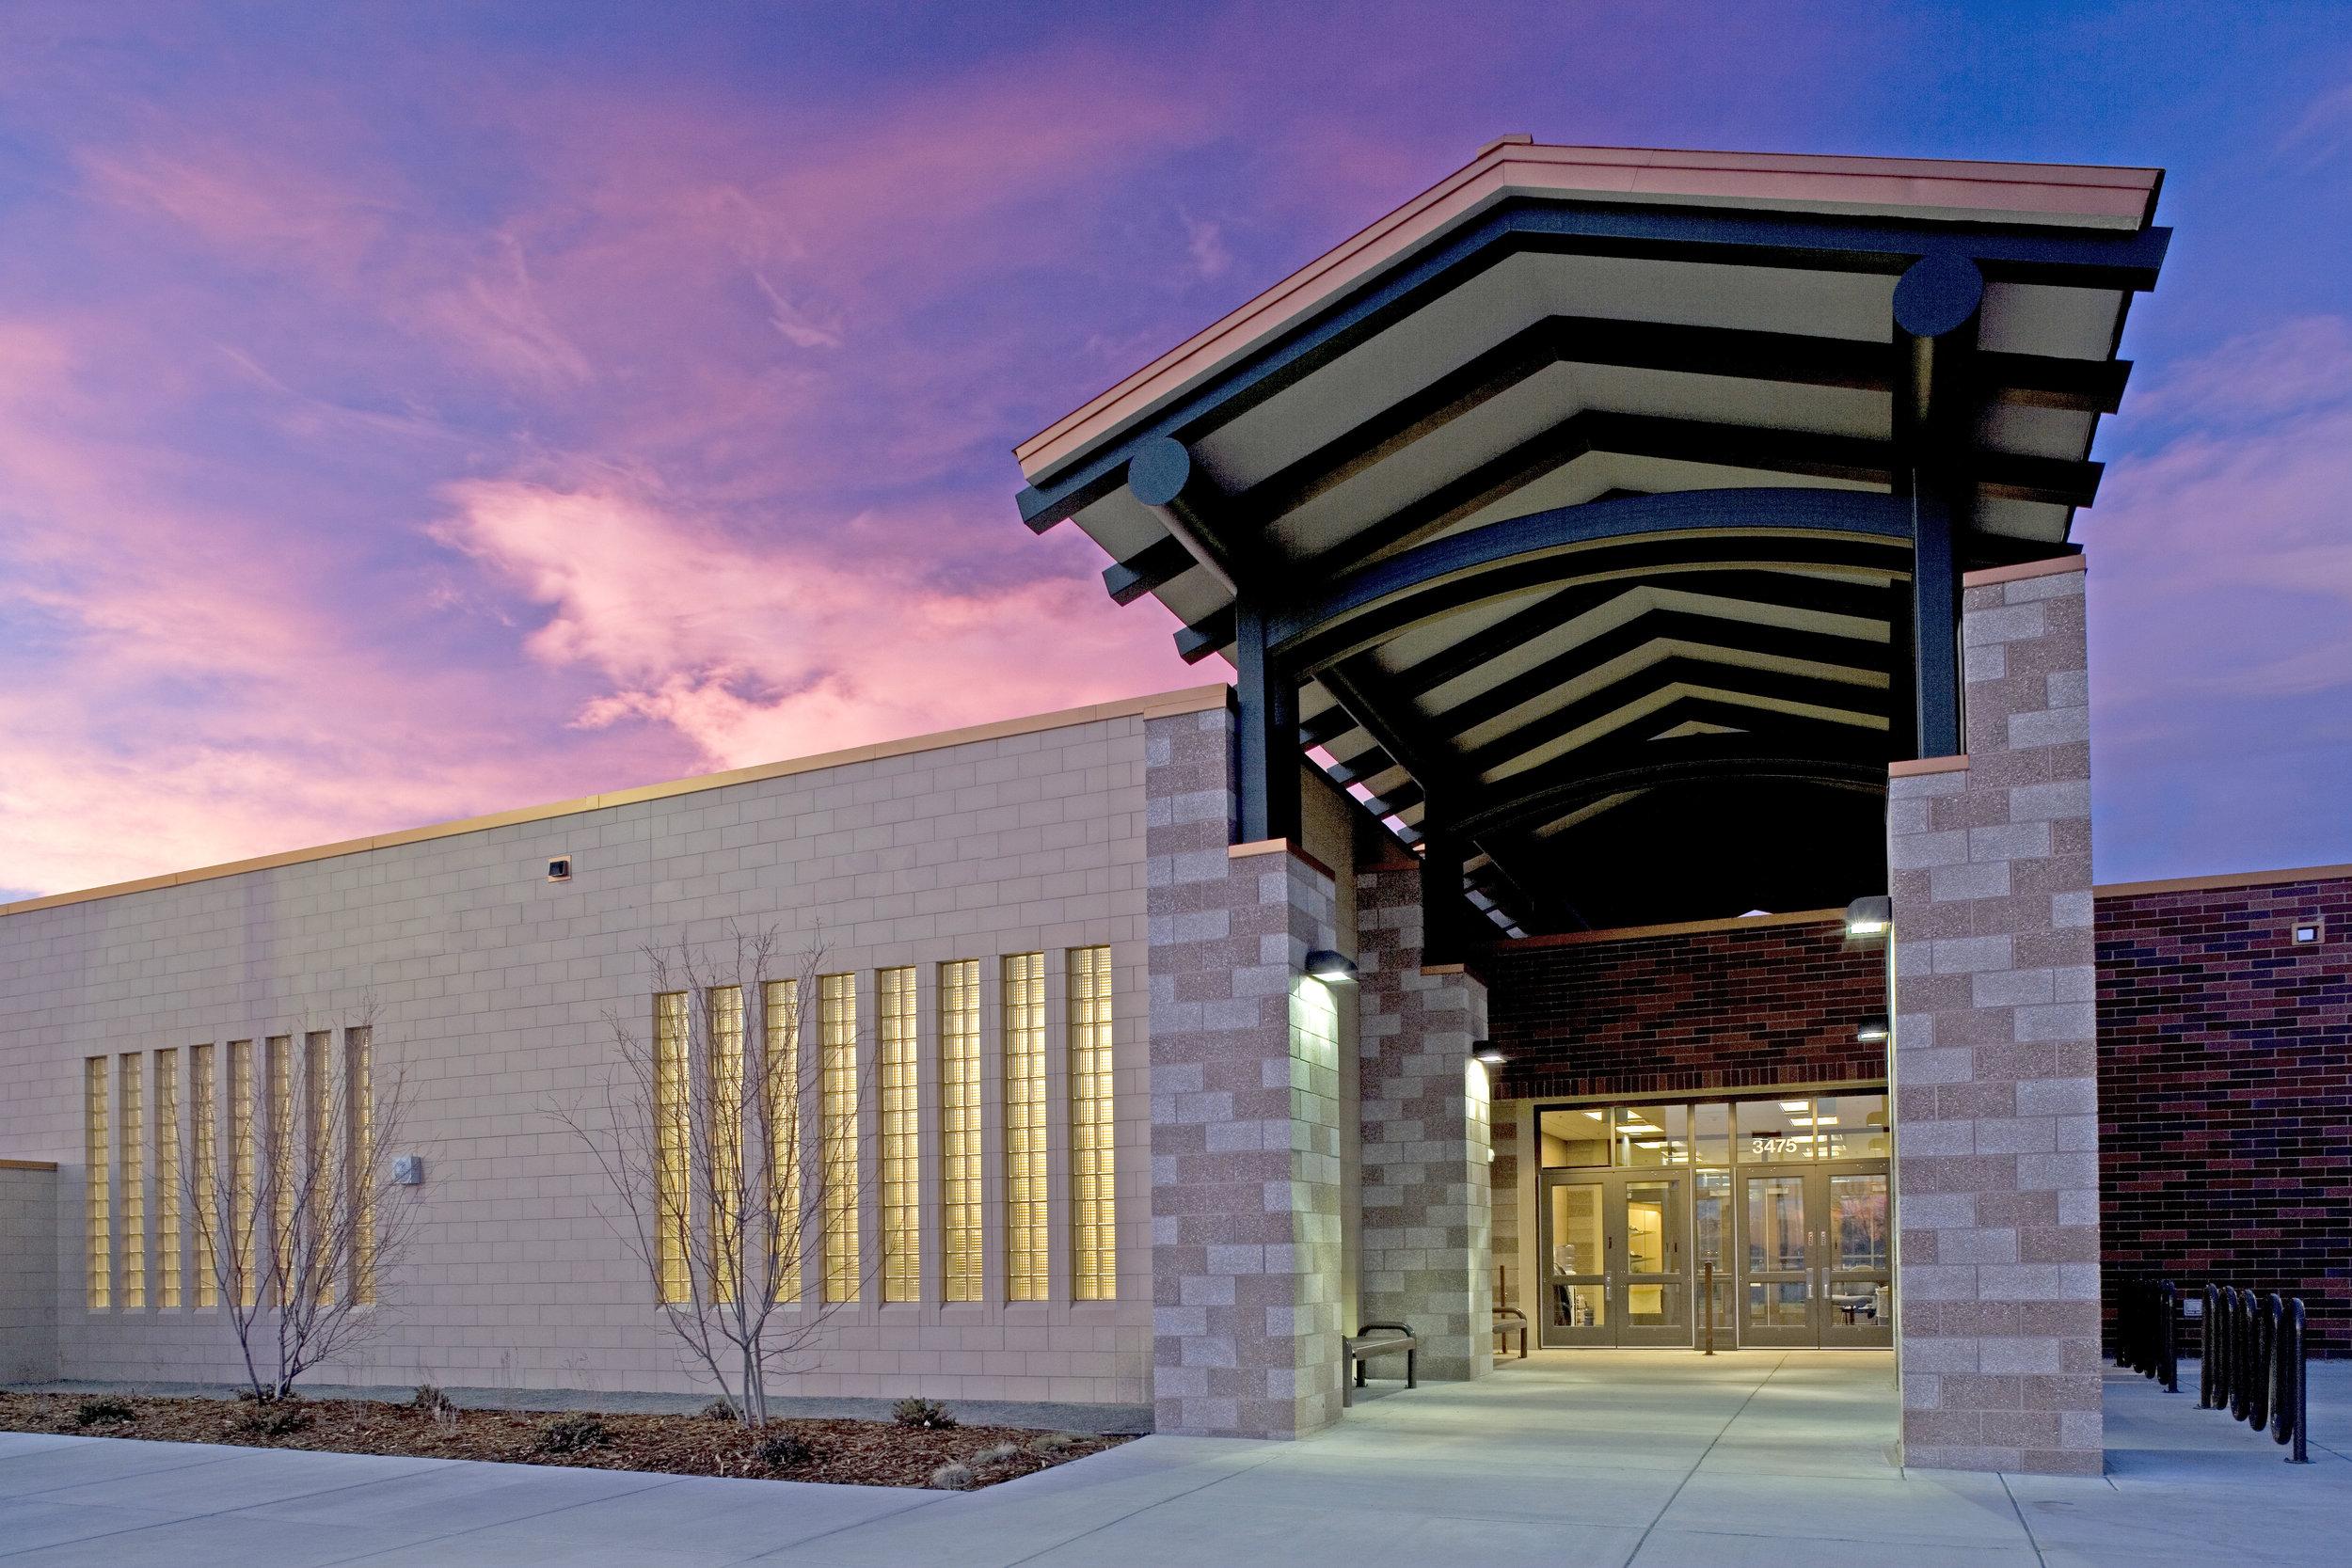 Hodgkins Elementary School